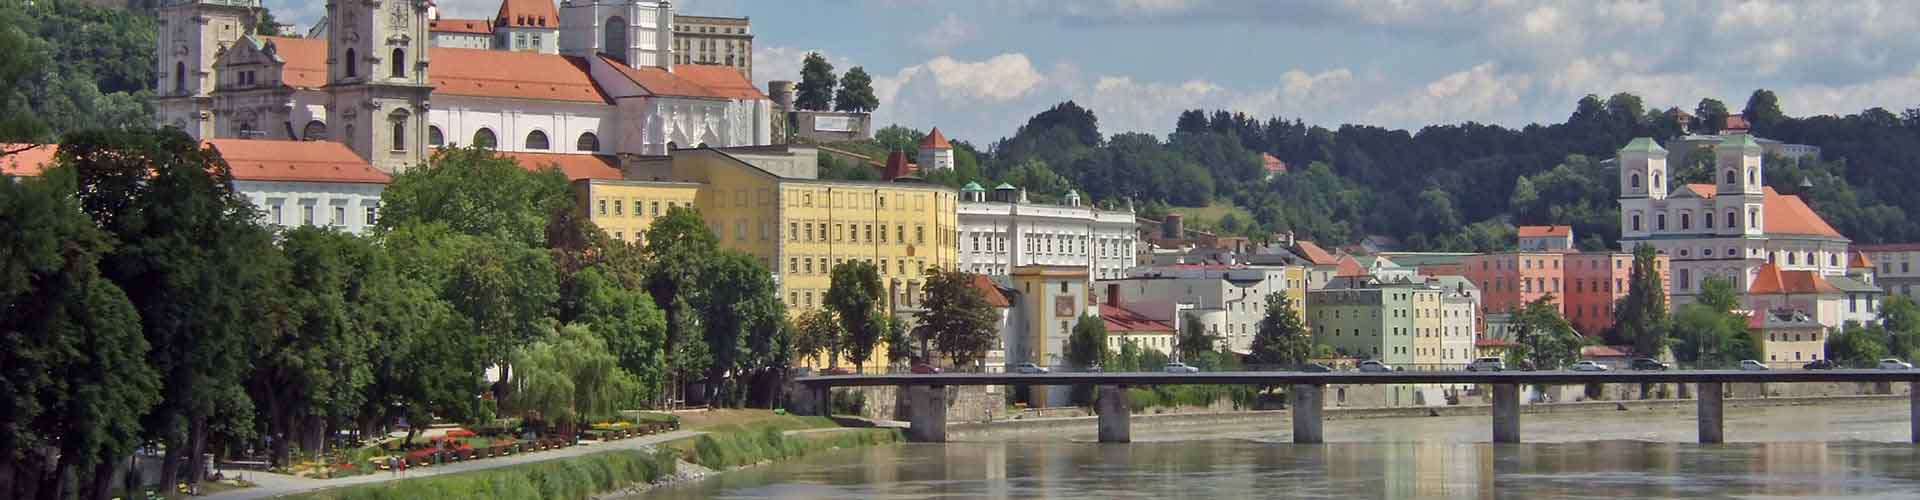 Passau - Albergues Juveniles en Passau. Mapas de Passau, Fotos y Comentarios para cada Albergue Juvenil en Passau.